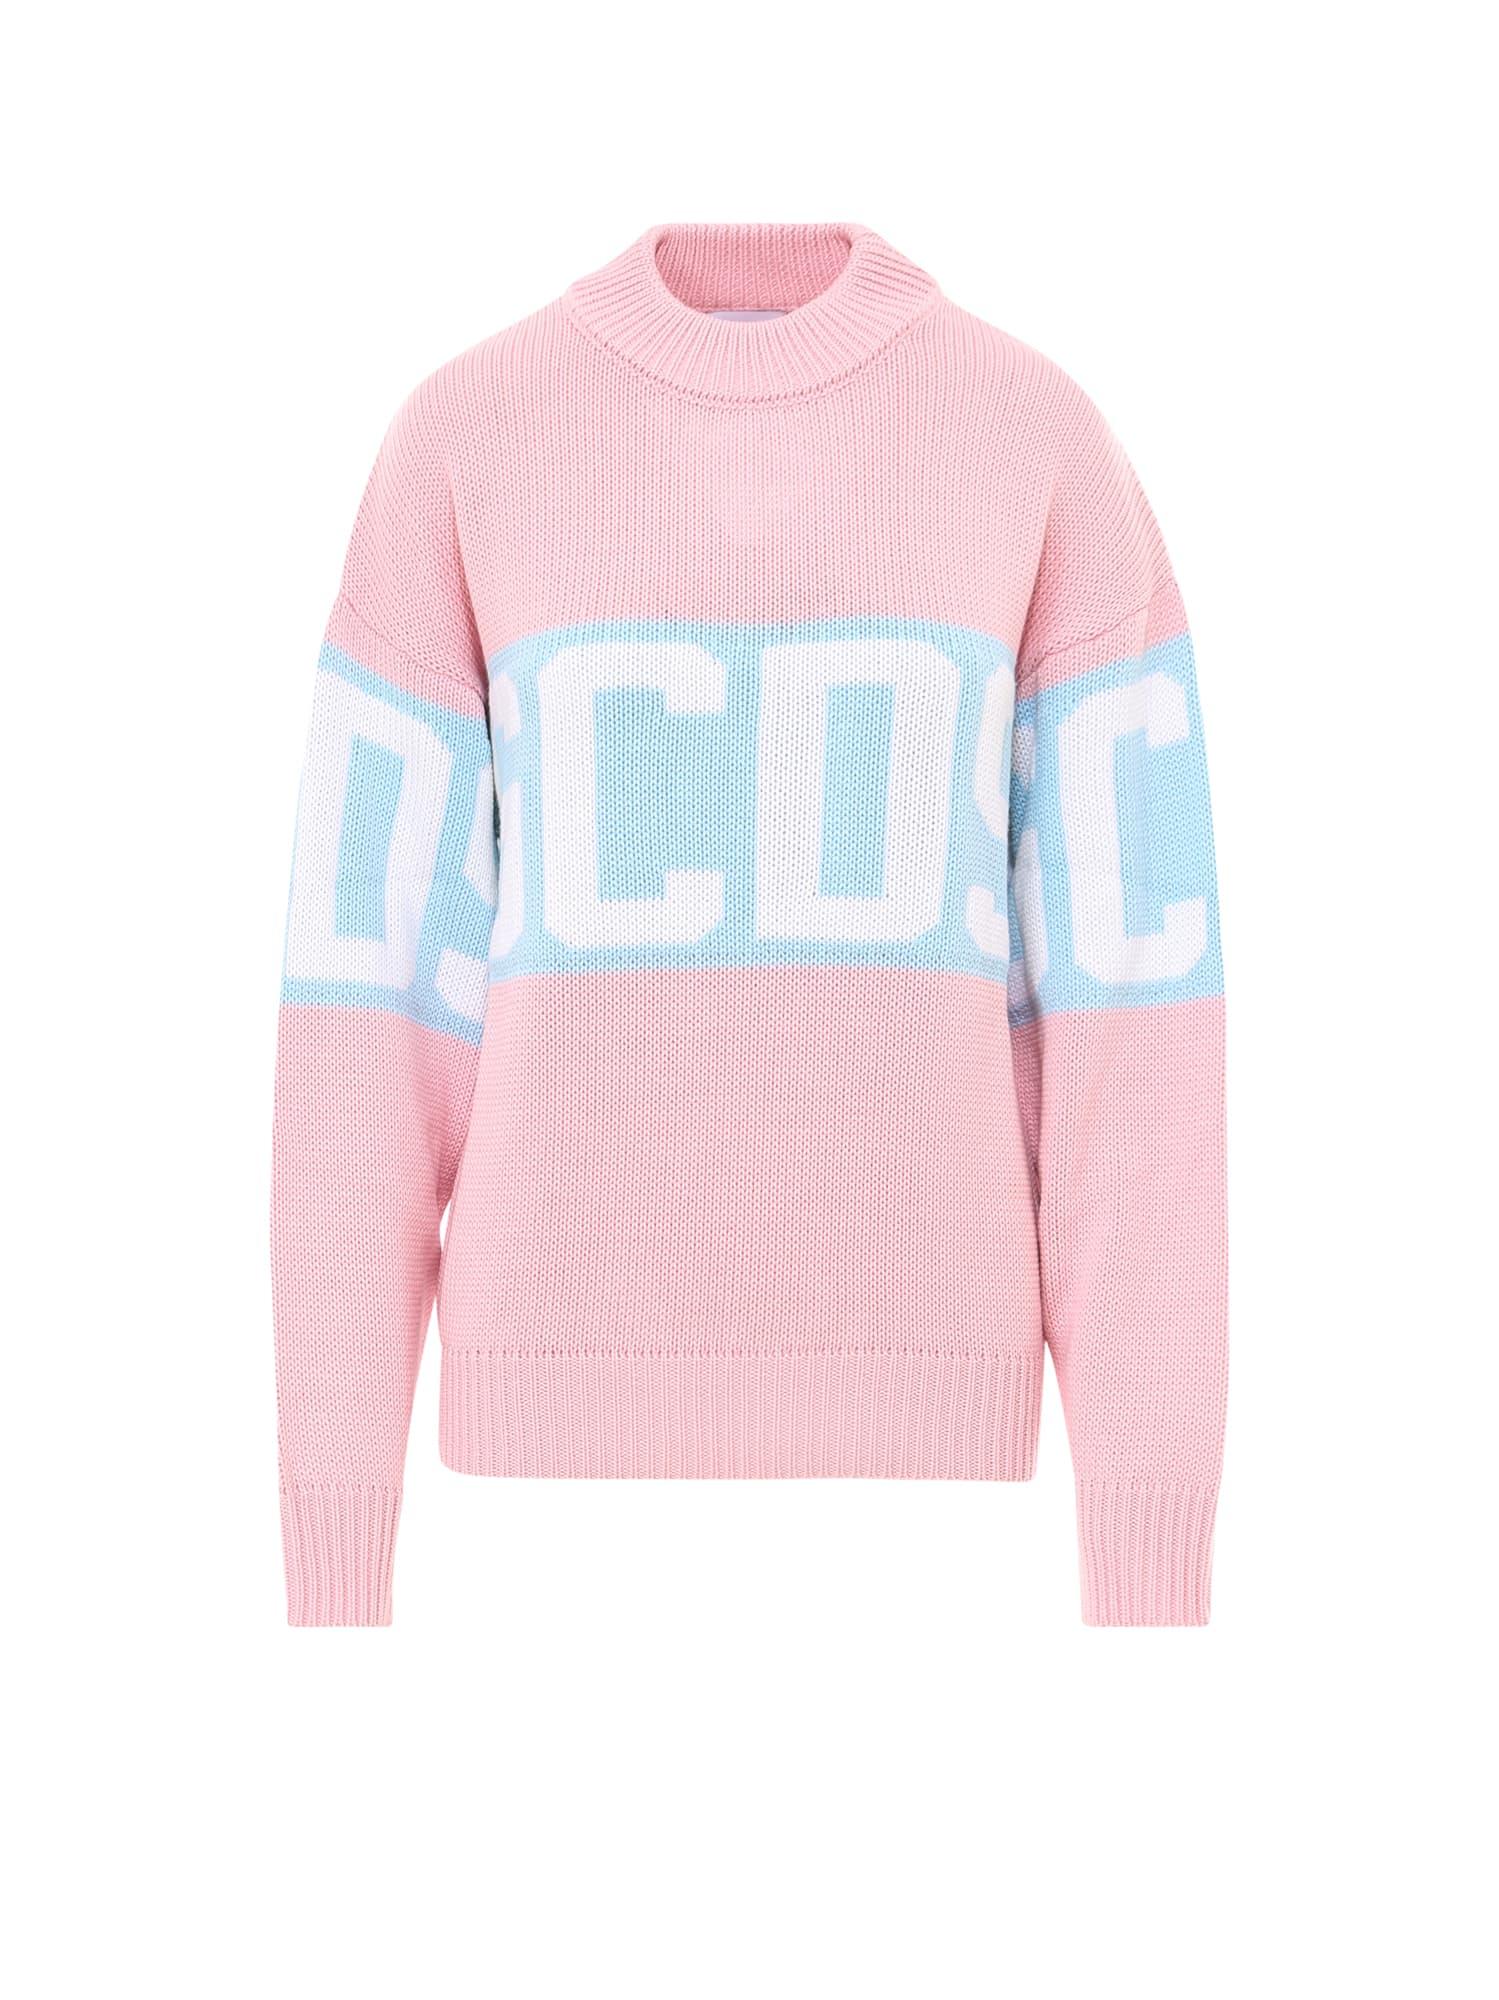 Gcds Sweater In Pink